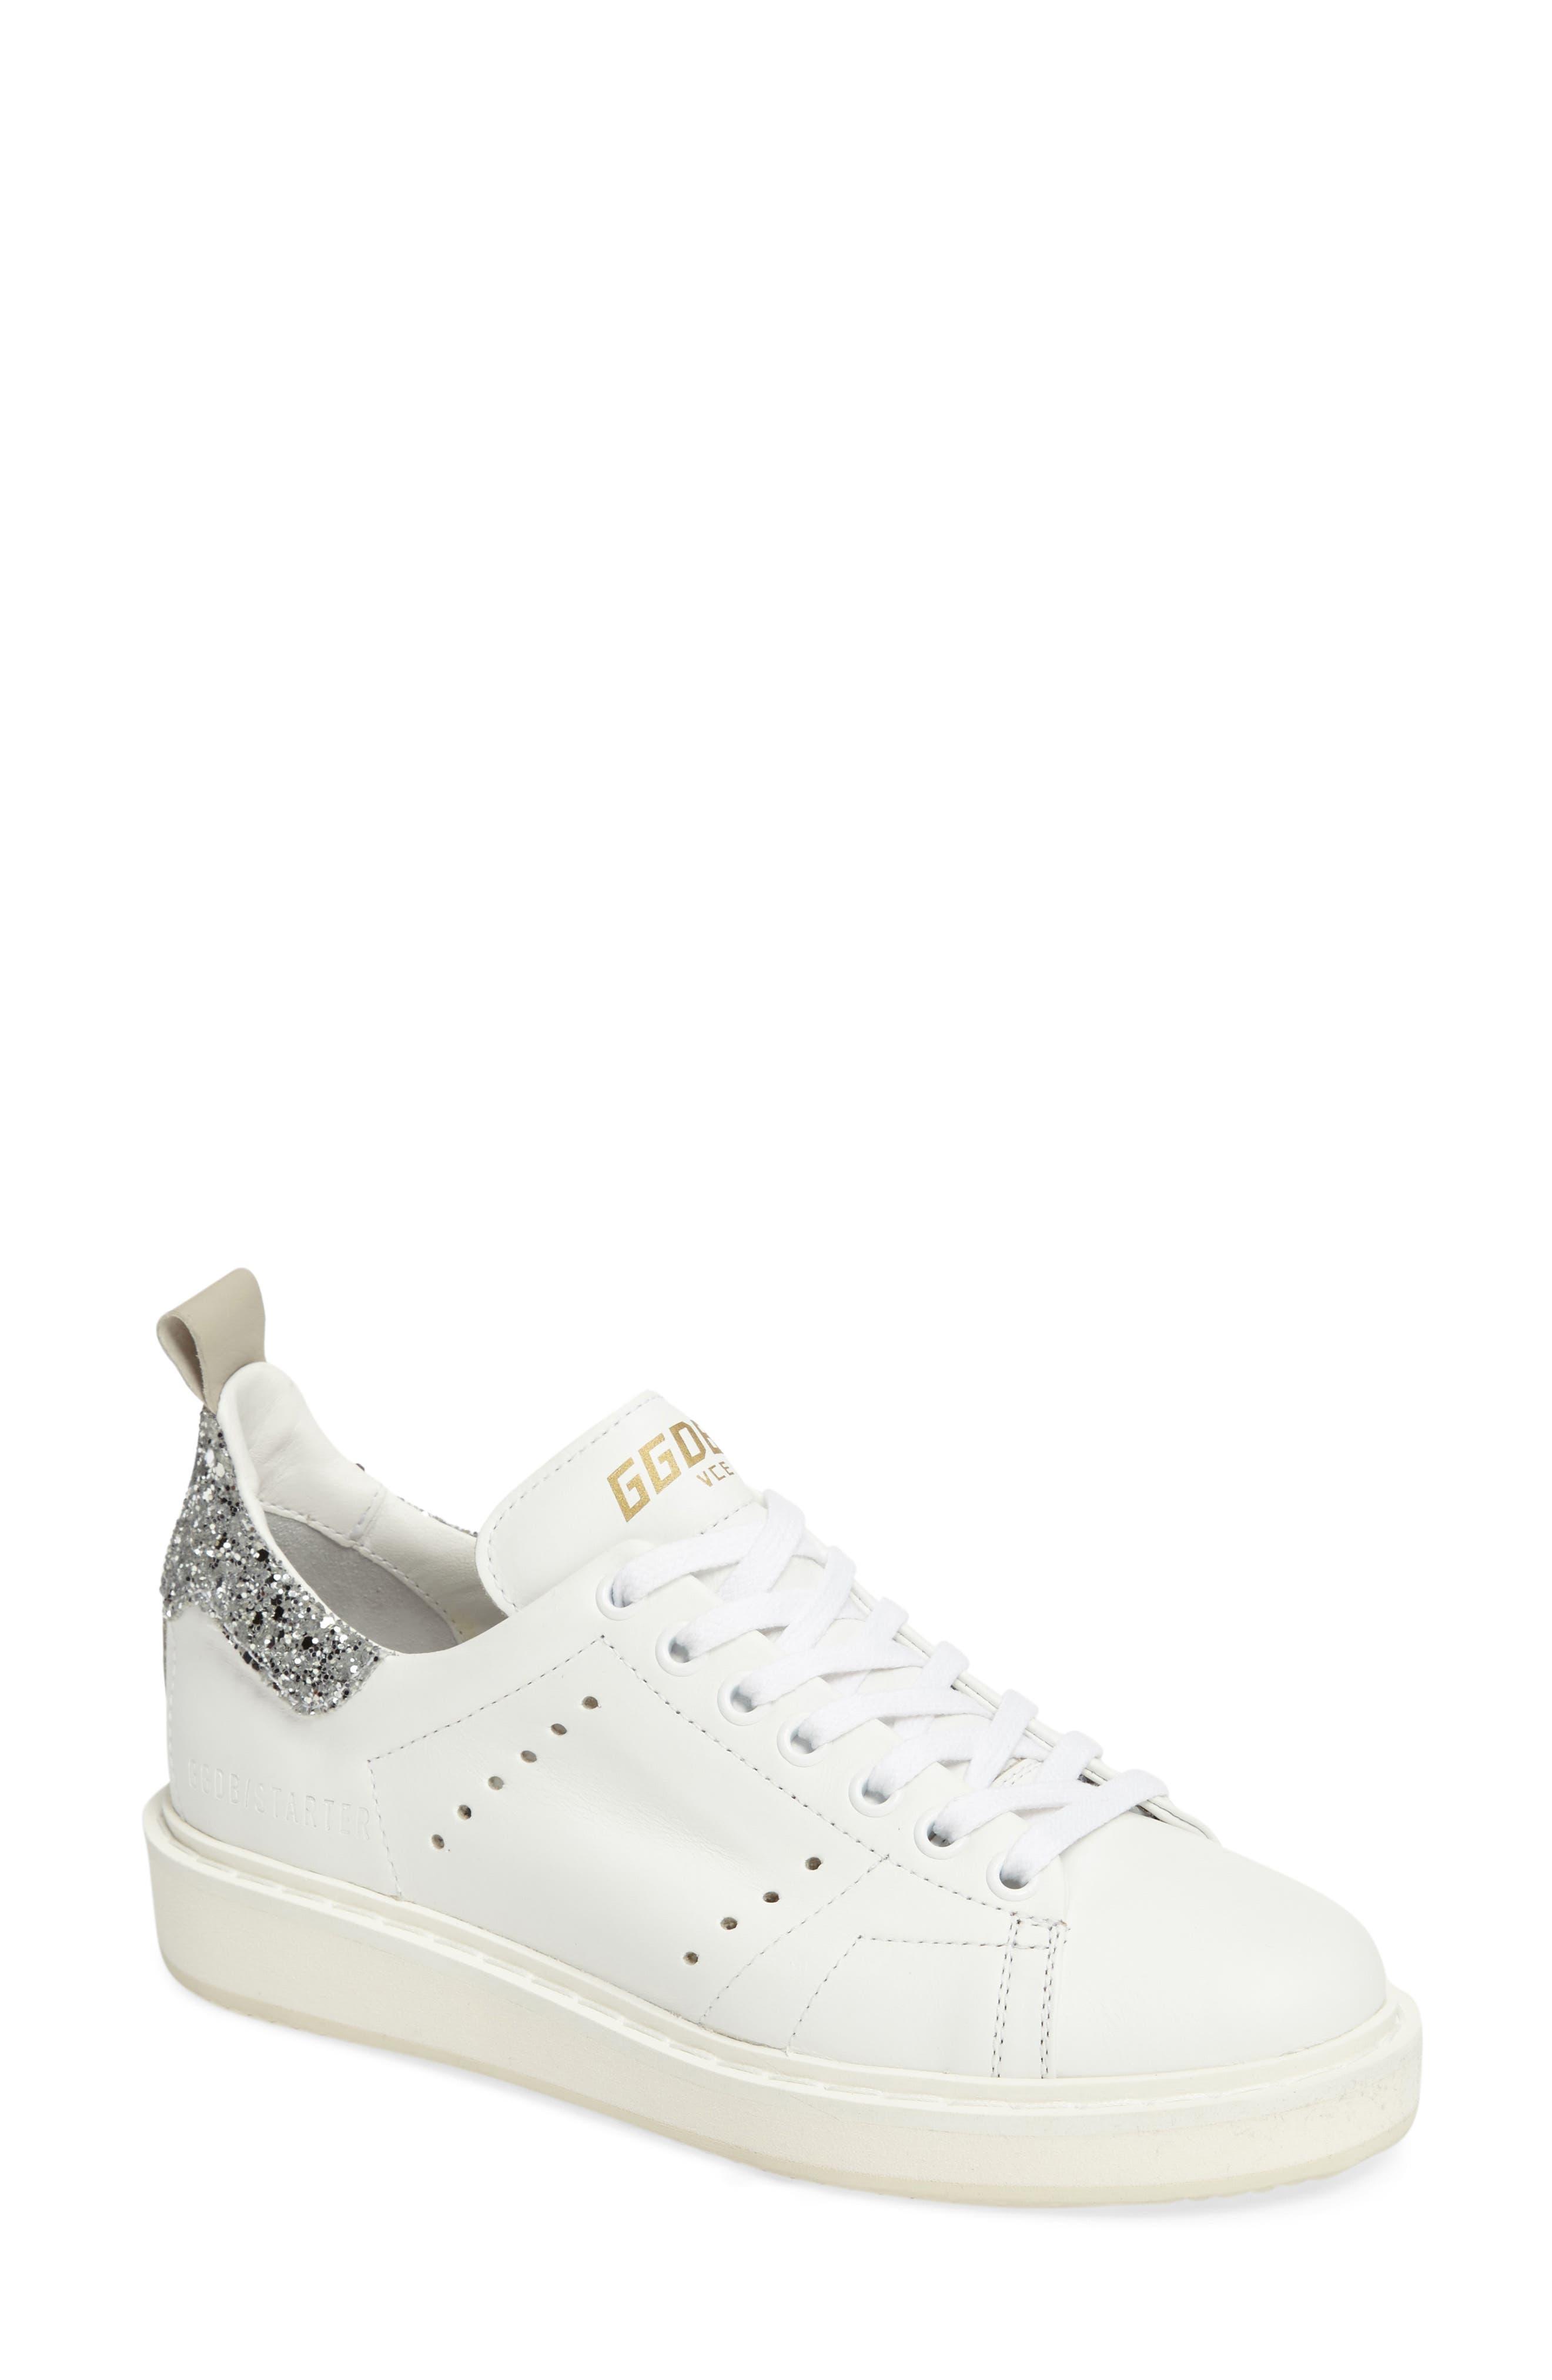 'Starter' Low Top Sneaker,                             Main thumbnail 1, color,                             White/ Silver Glitter